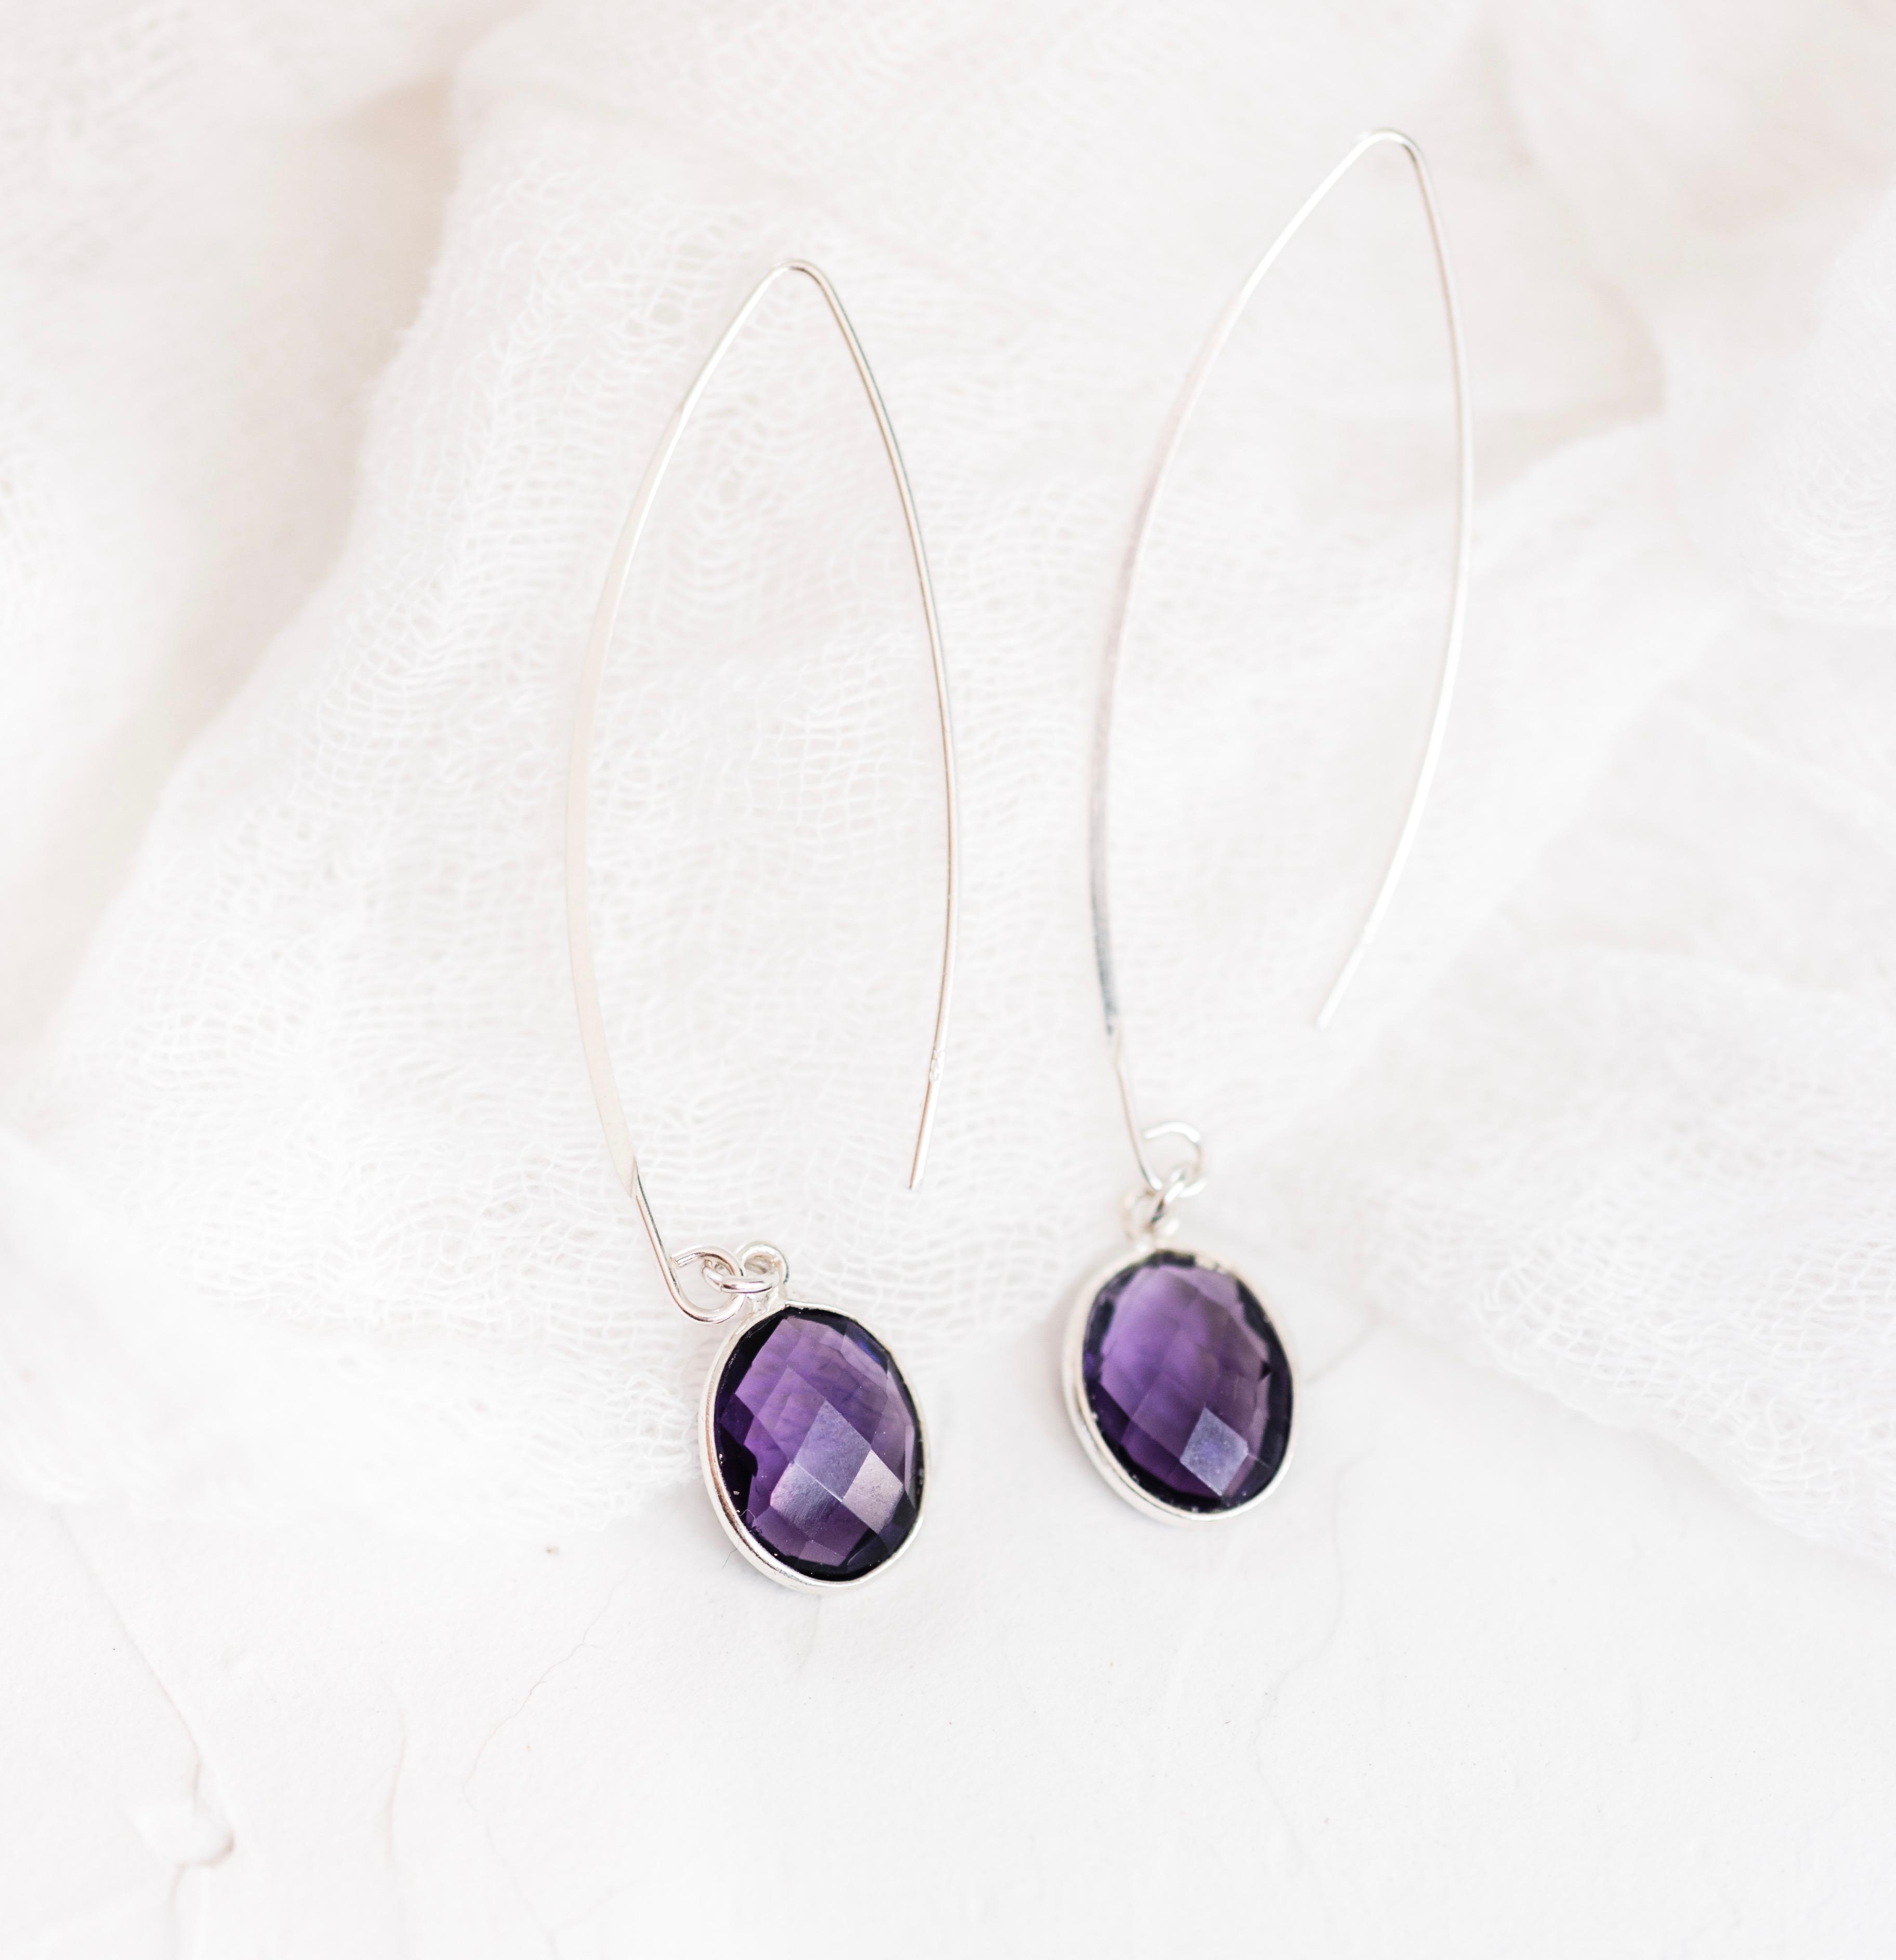 Amethyst Quartz Sterling Silver Threader Earrings